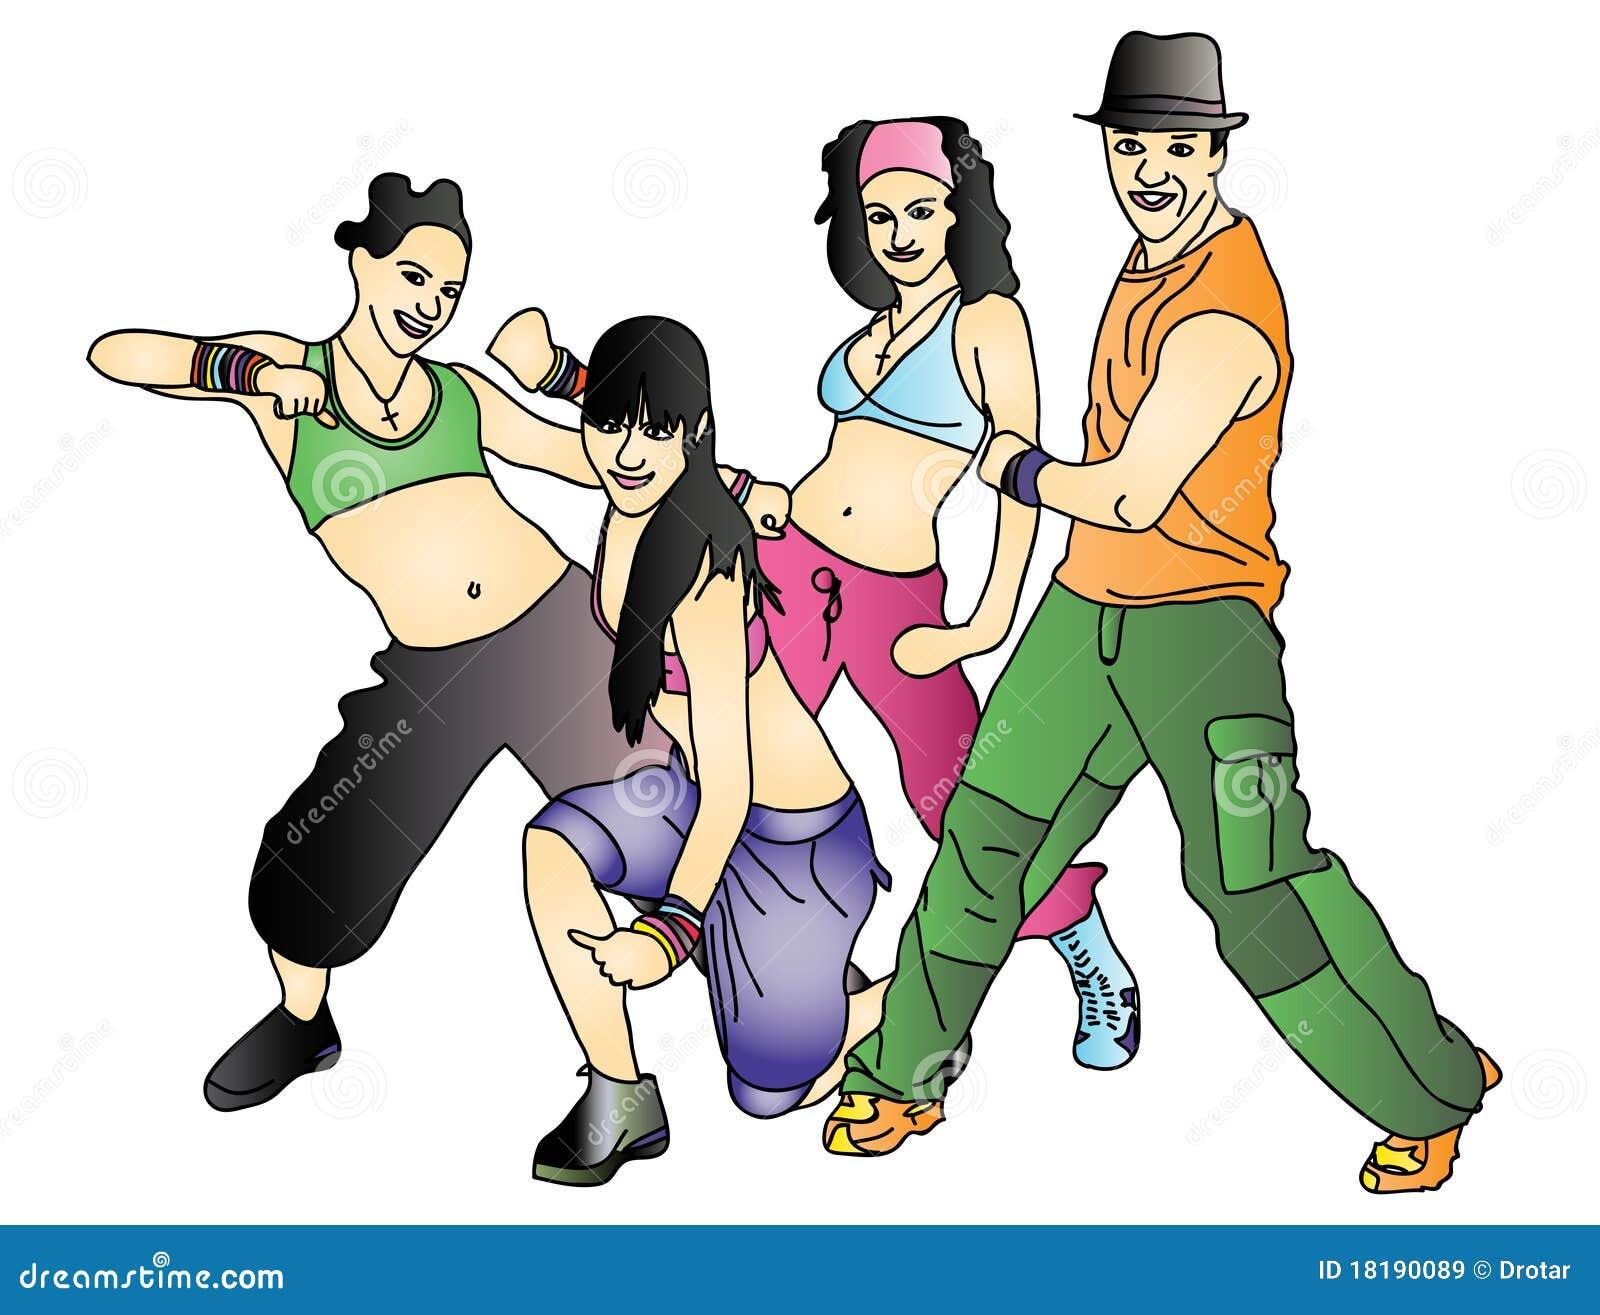 Zumba Logo png download - 720*405 - Free Transparent Zumba png Download. -  CleanPNG / KissPNG in 2020 | Zumba, Zumba logo, Zumba dance